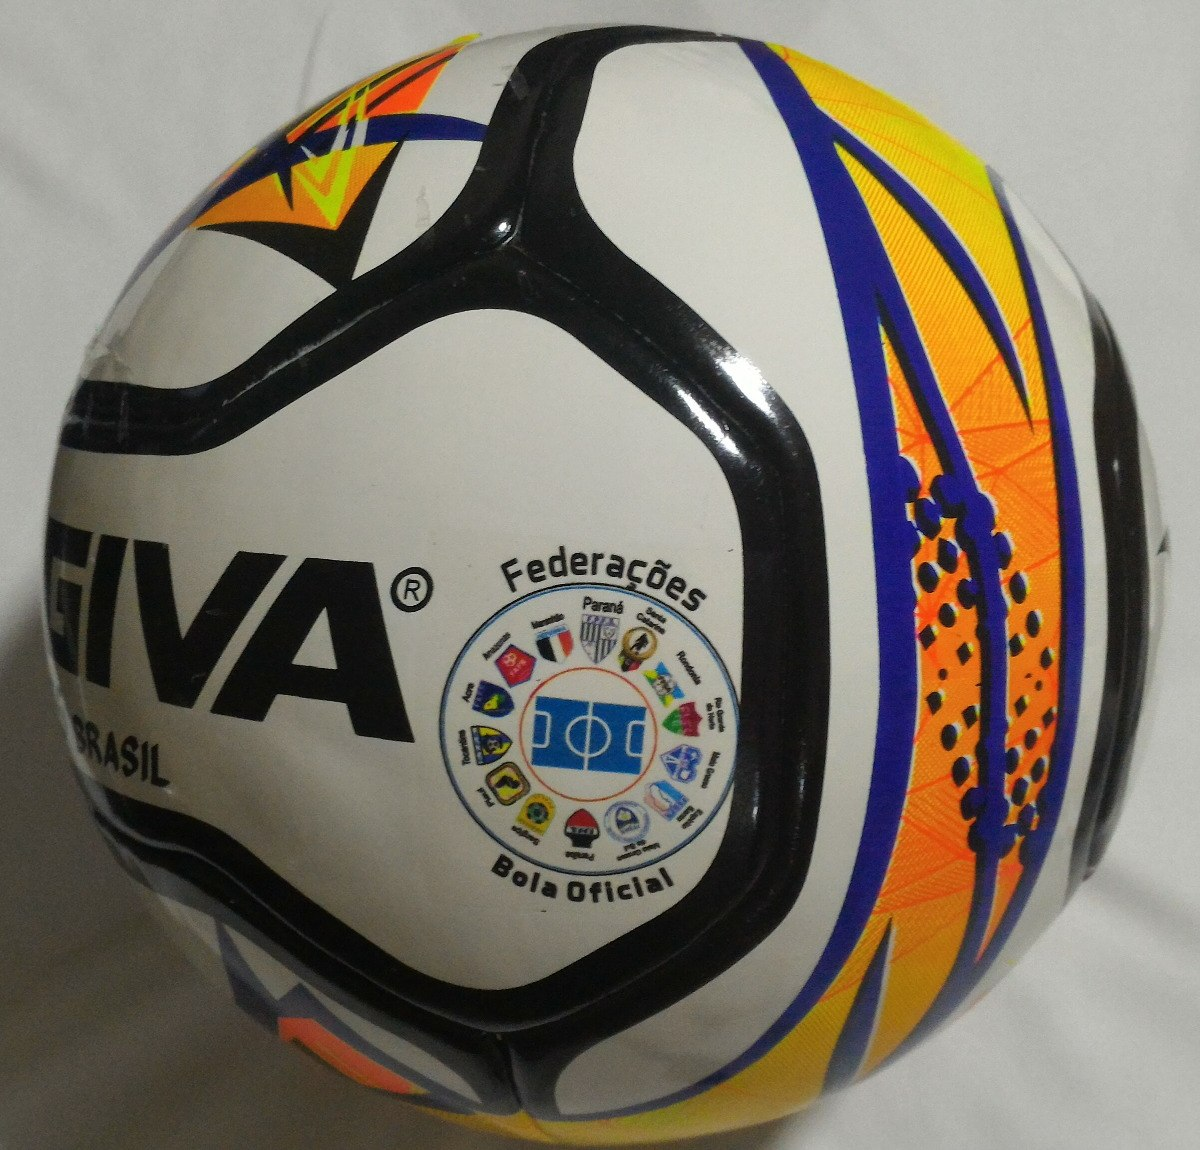 01dd14276e457 bola futsal kagiva f5 pro brasil - federações 2018. Carregando zoom.